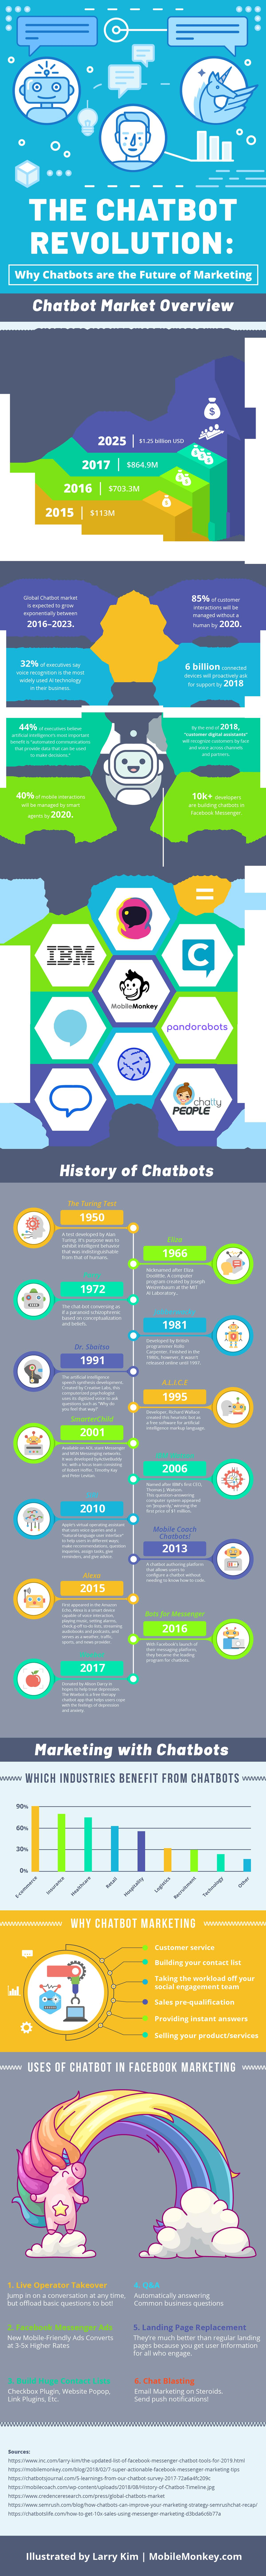 Chatbot Statistics [Infographic]